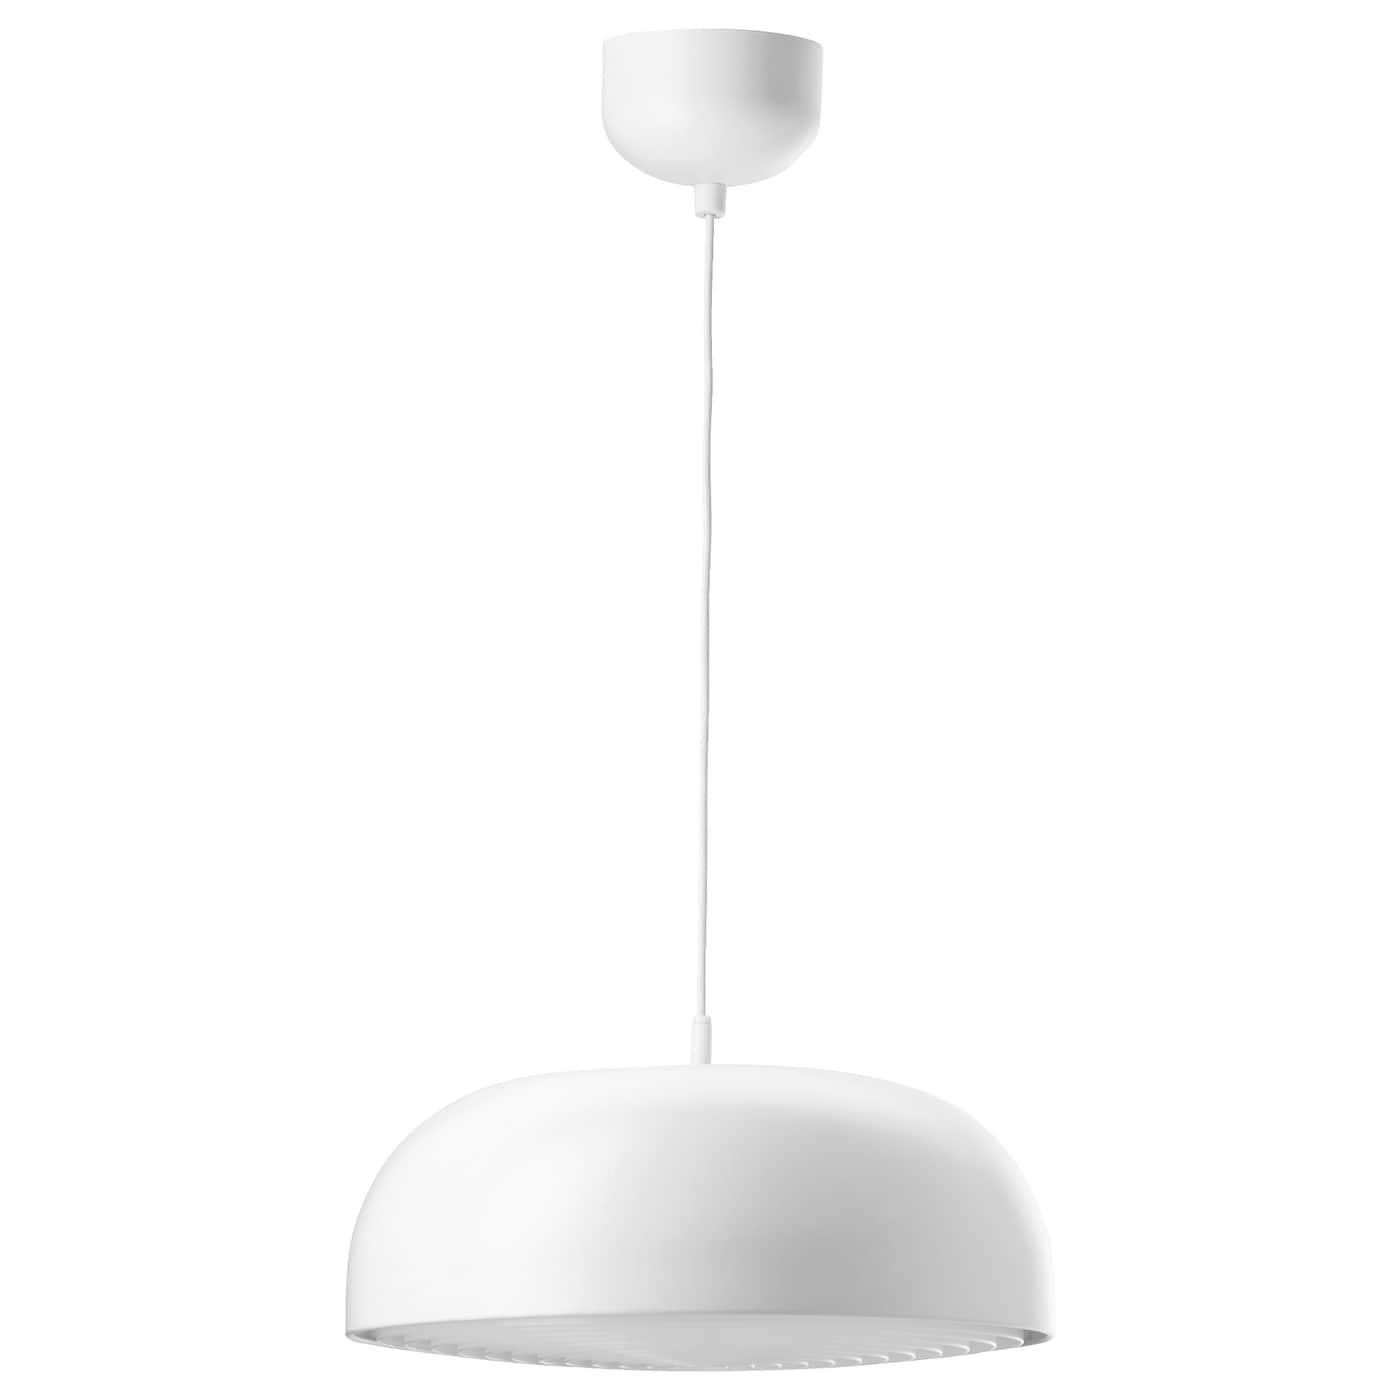 NYMANE Pendant Lamp White